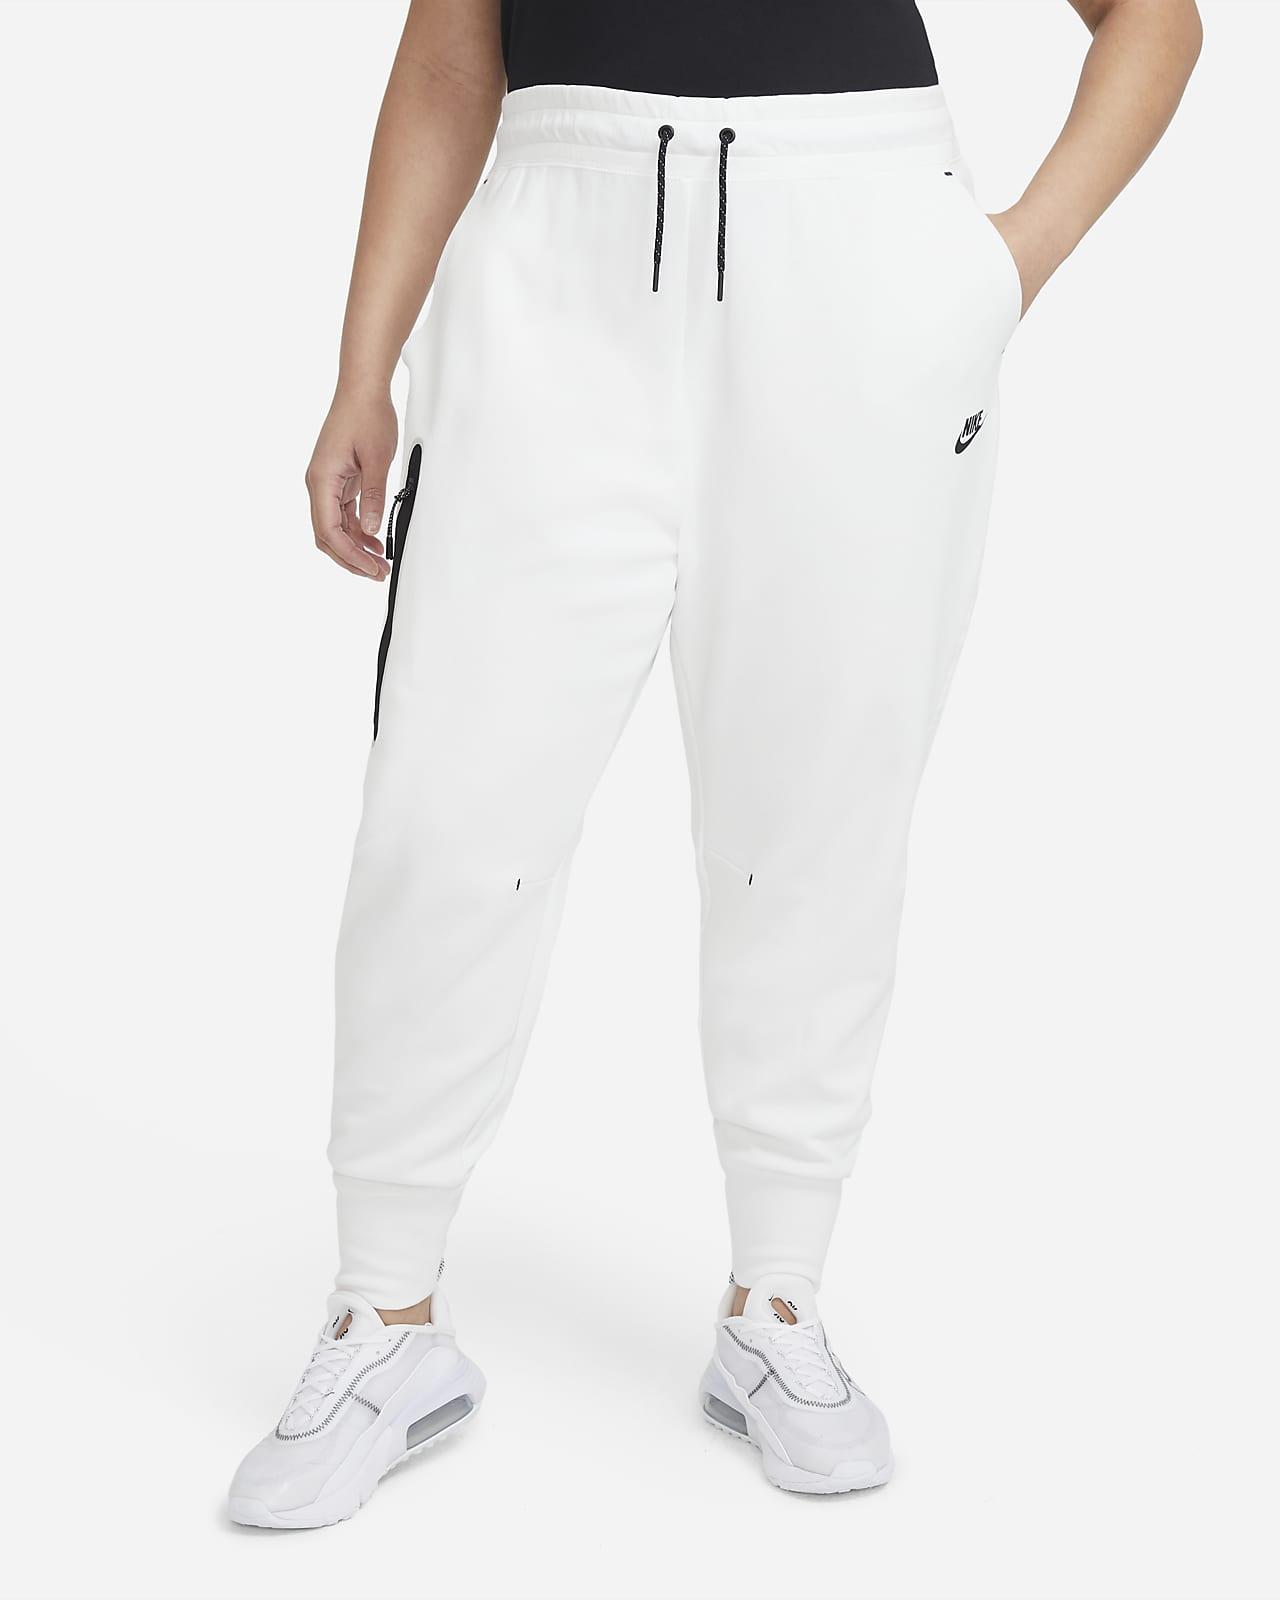 Pantalones para mujer talla grande Nike Sportswear Tech Fleece